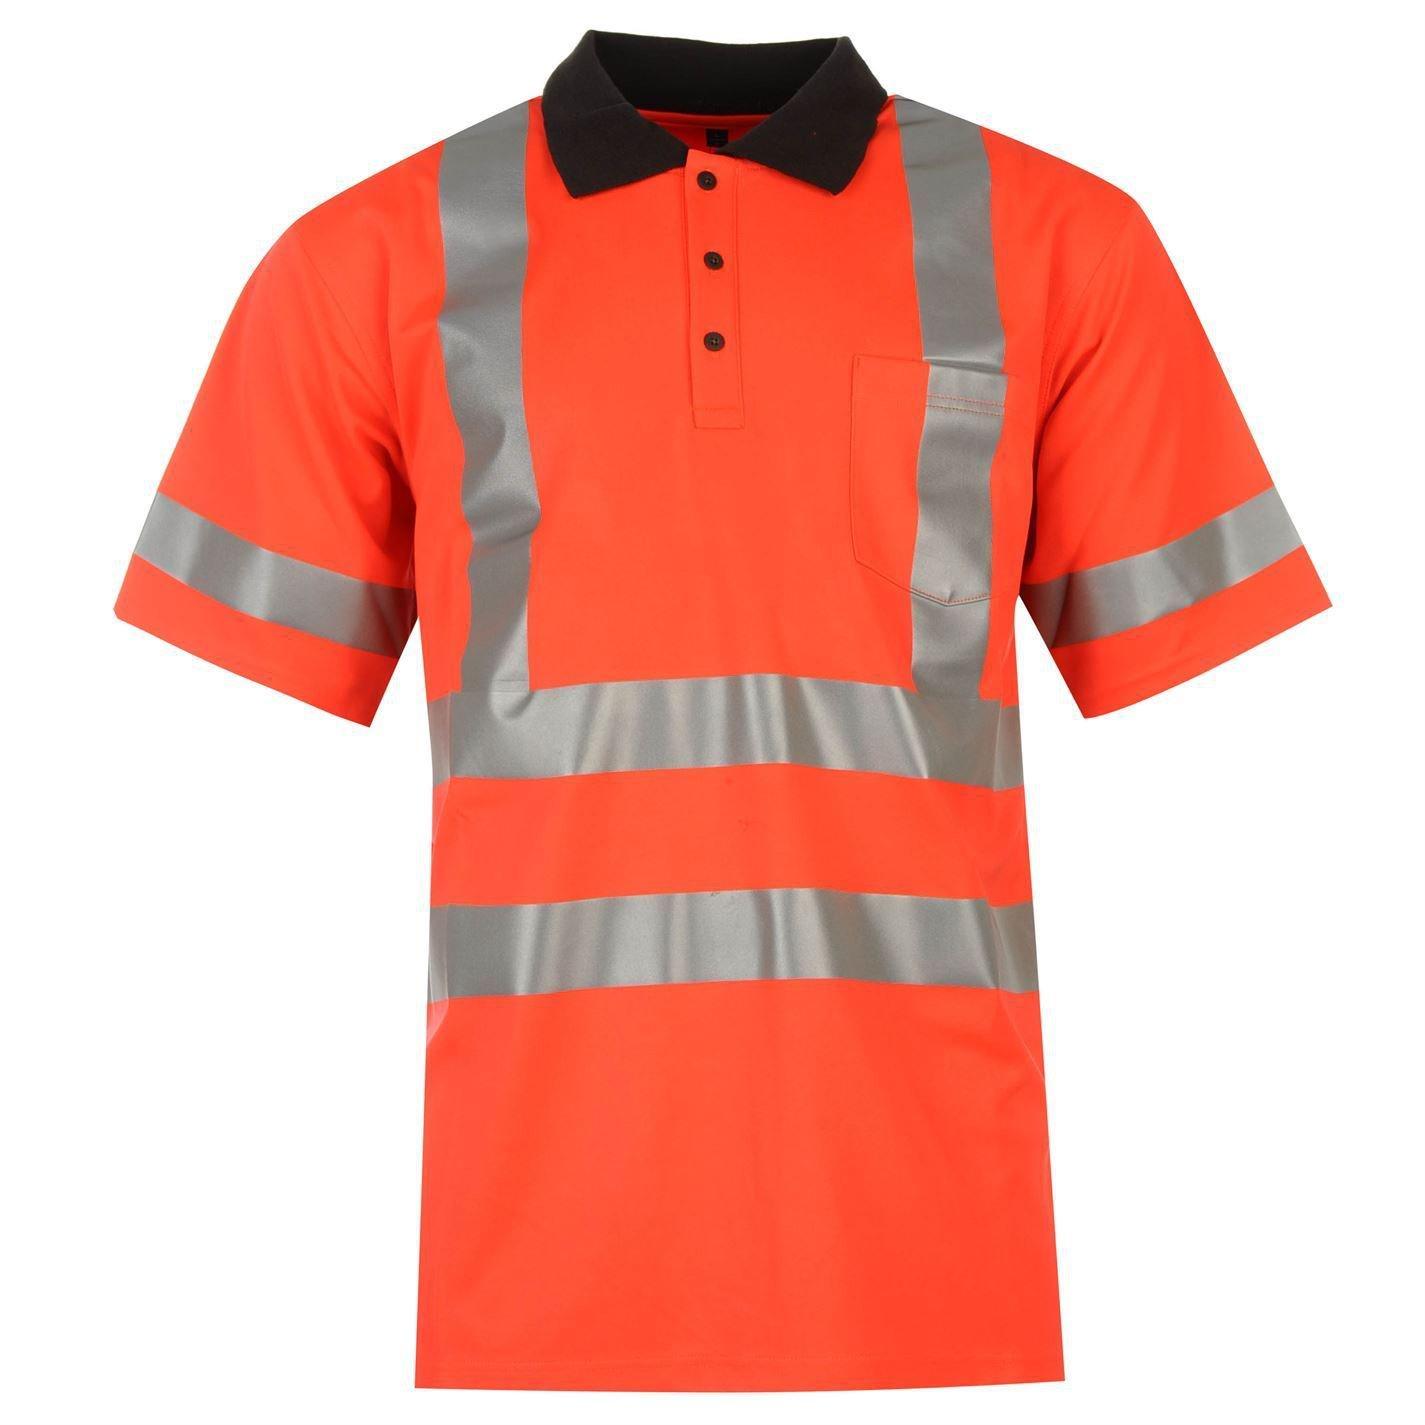 Helly Hansen Mens Folkestone Hi Vis Polo T Shirt Tee Top Workwear Safety